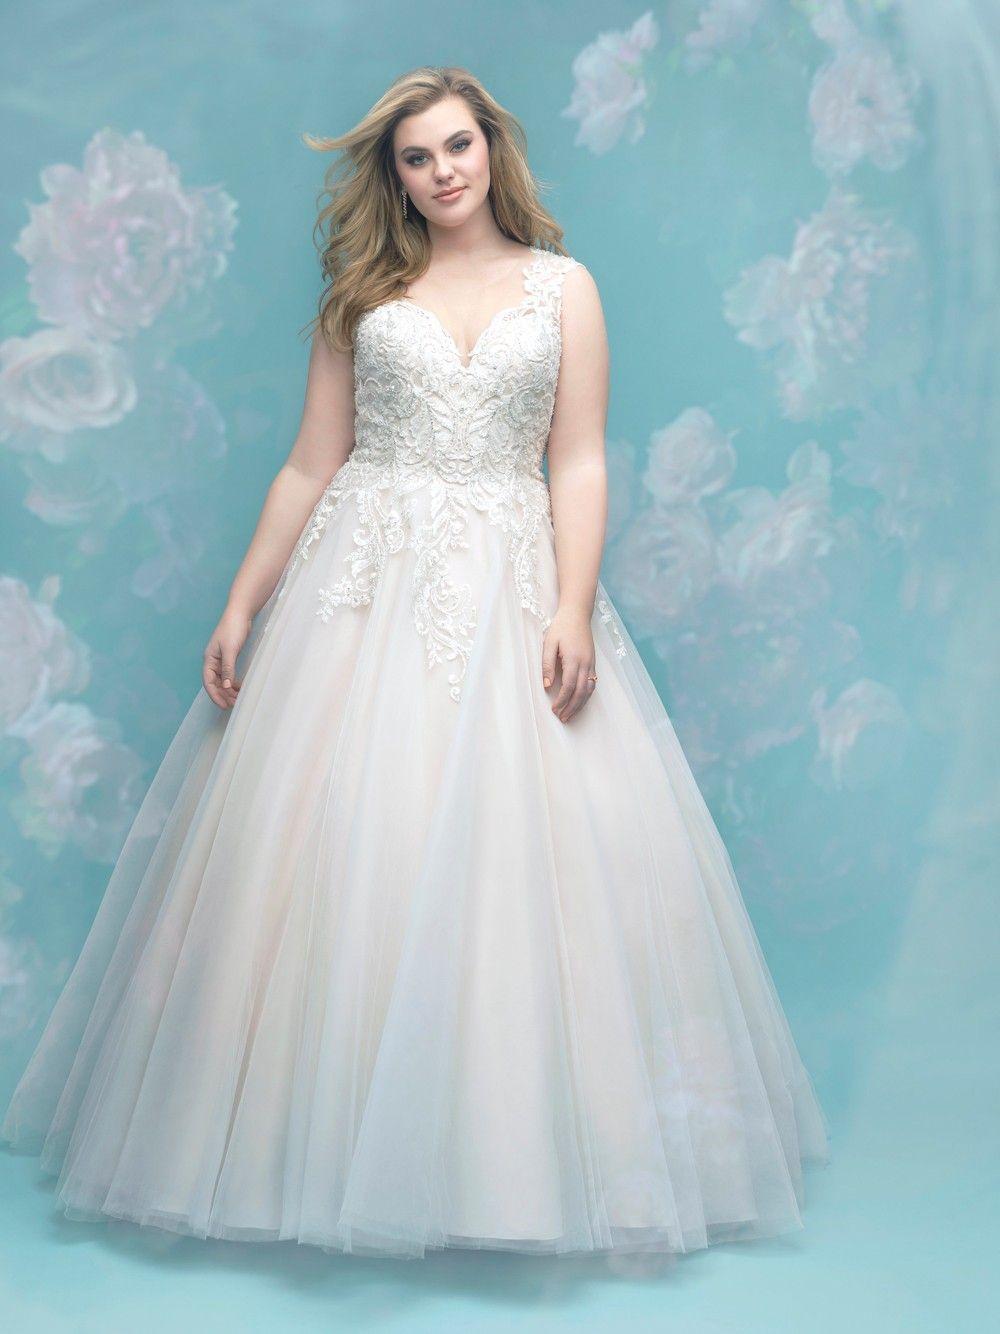 Allure Bridals W401 Wedding Dress Weddingdresses Wedding Bride Allurebridals Allure Plussiz Ball Gowns Wedding Allure Bridal Lace Womens Wedding Dresses